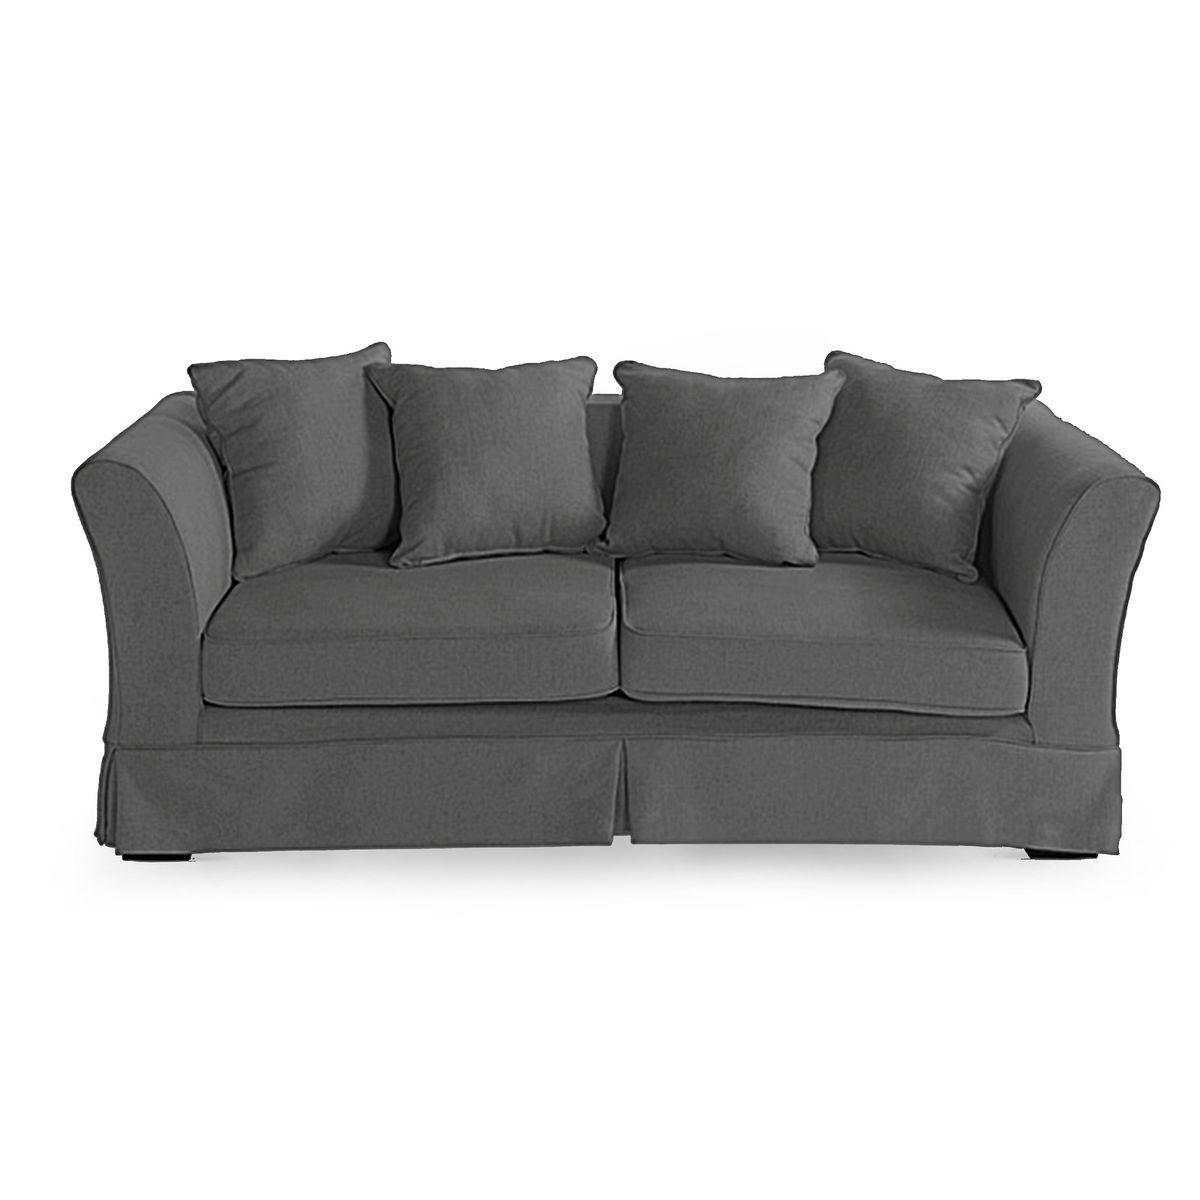 Sofa IHLOW Leinen dunkelgrau ca L:196 x T:86 x H:73,5 cm